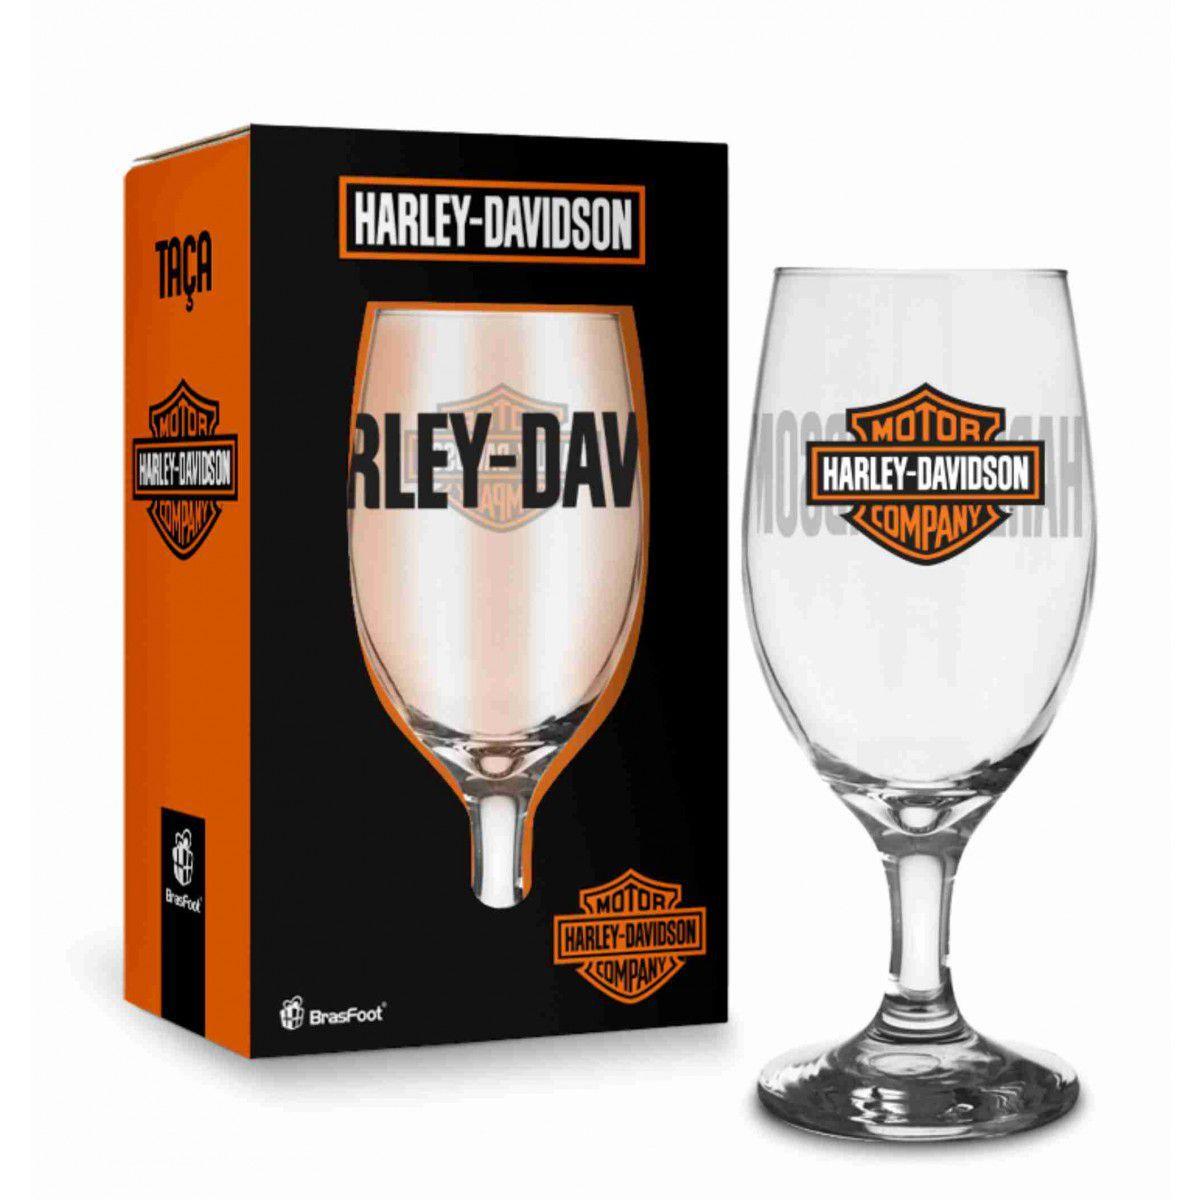 Taça Windsor Harley Davidson